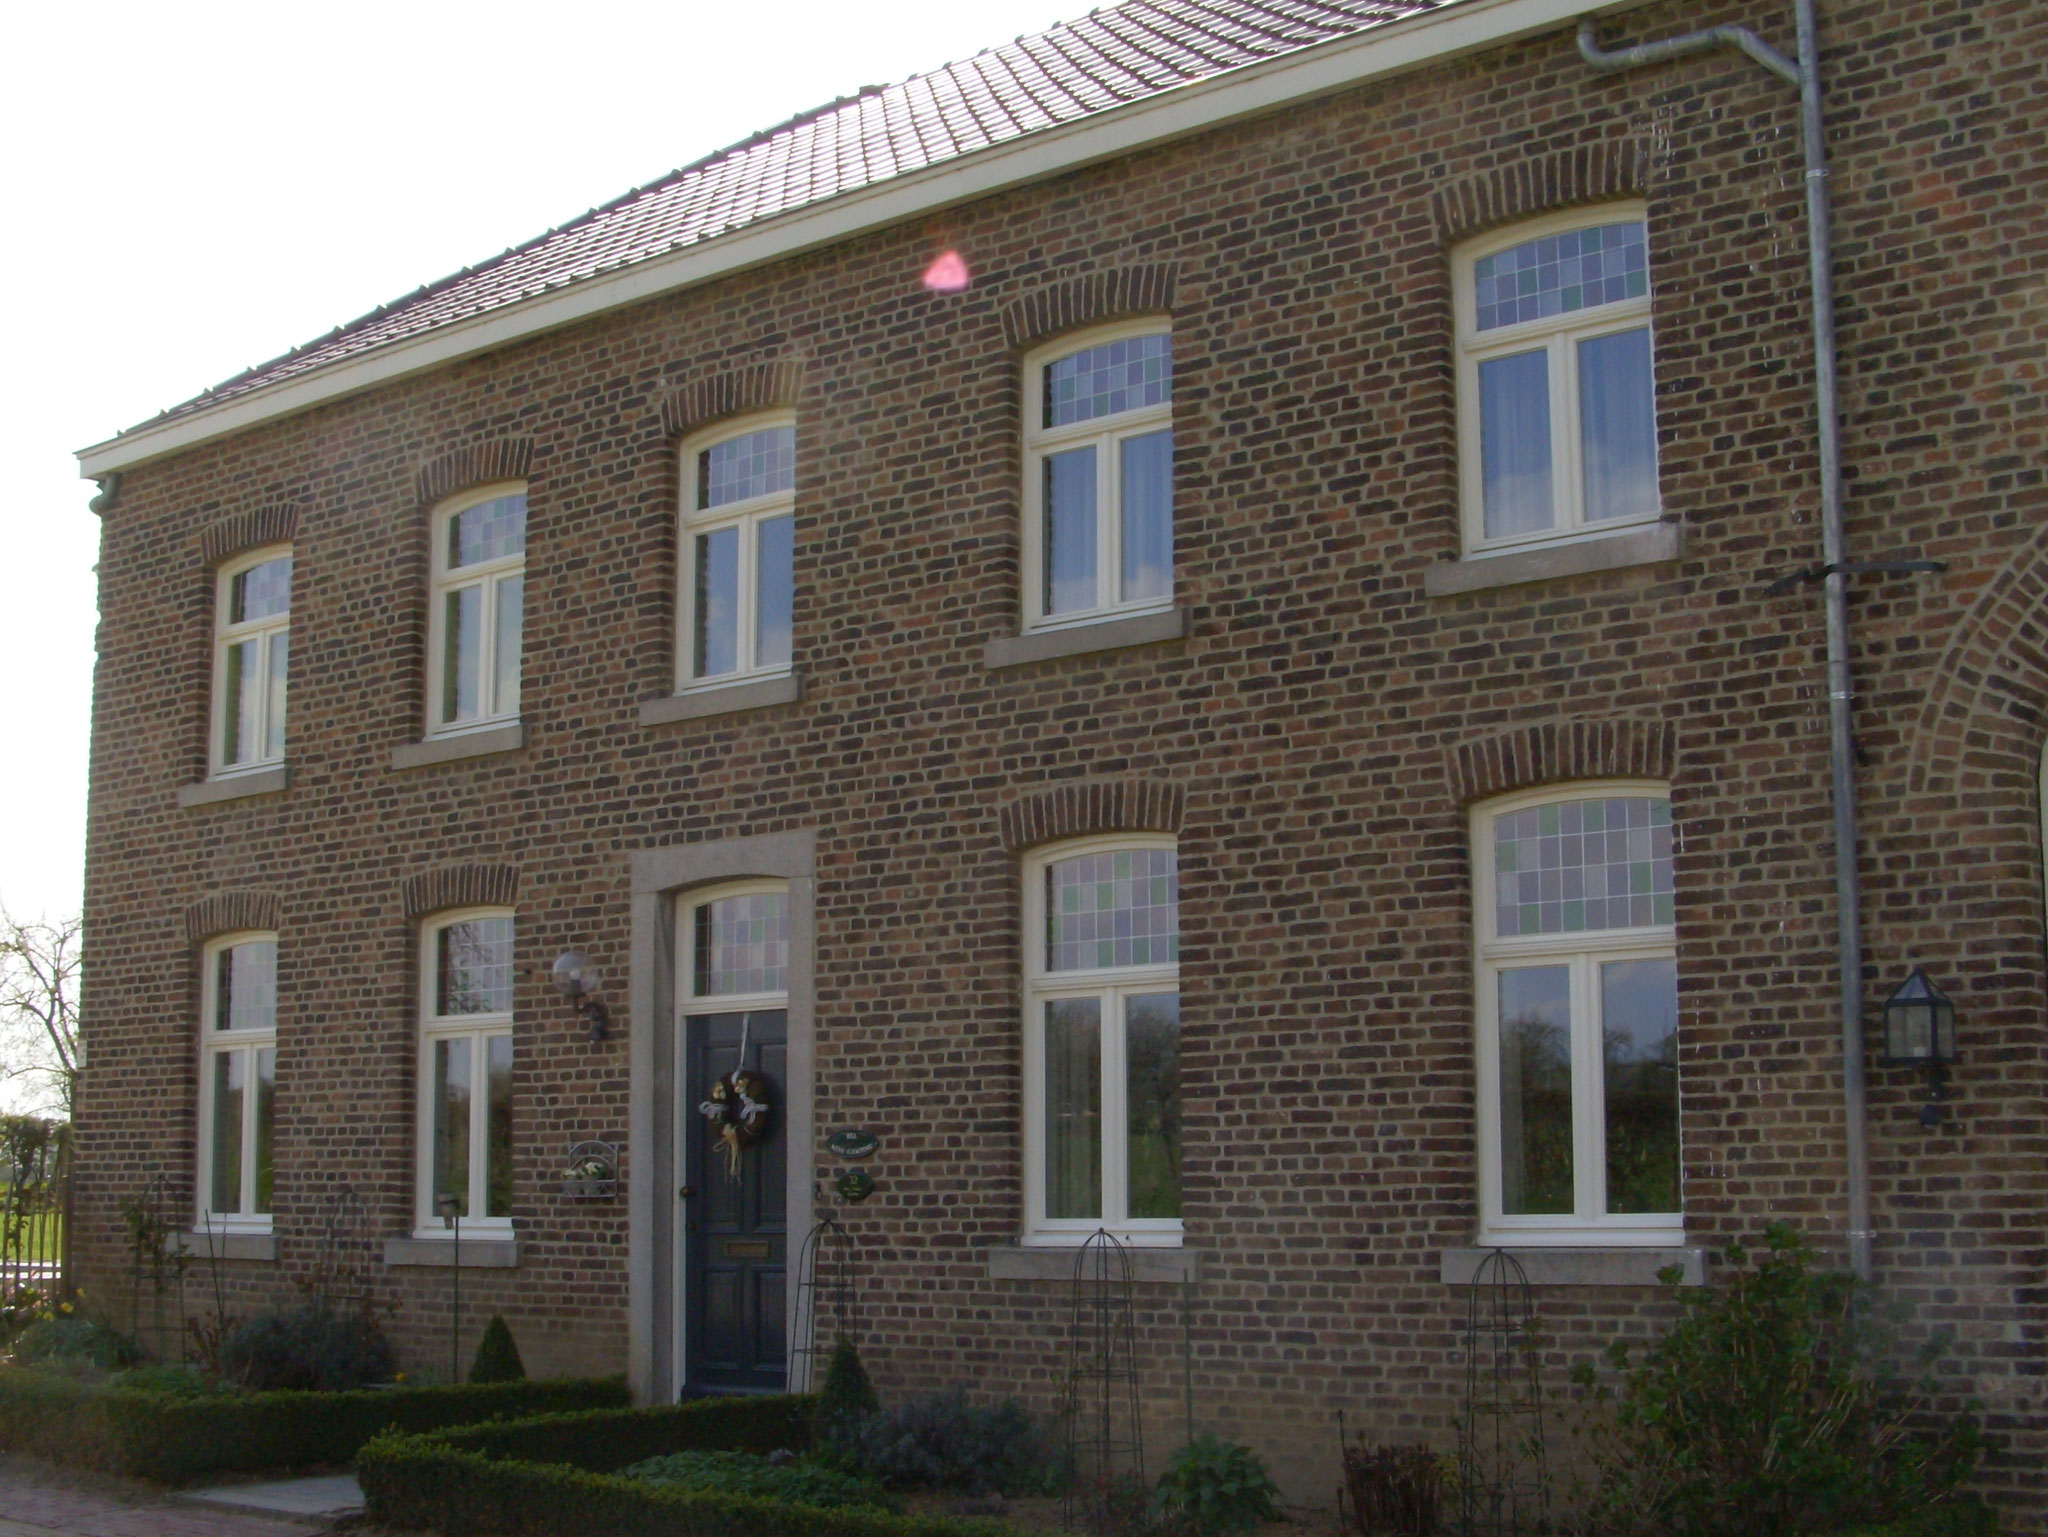 houten ramen en voordeur in Moerslag